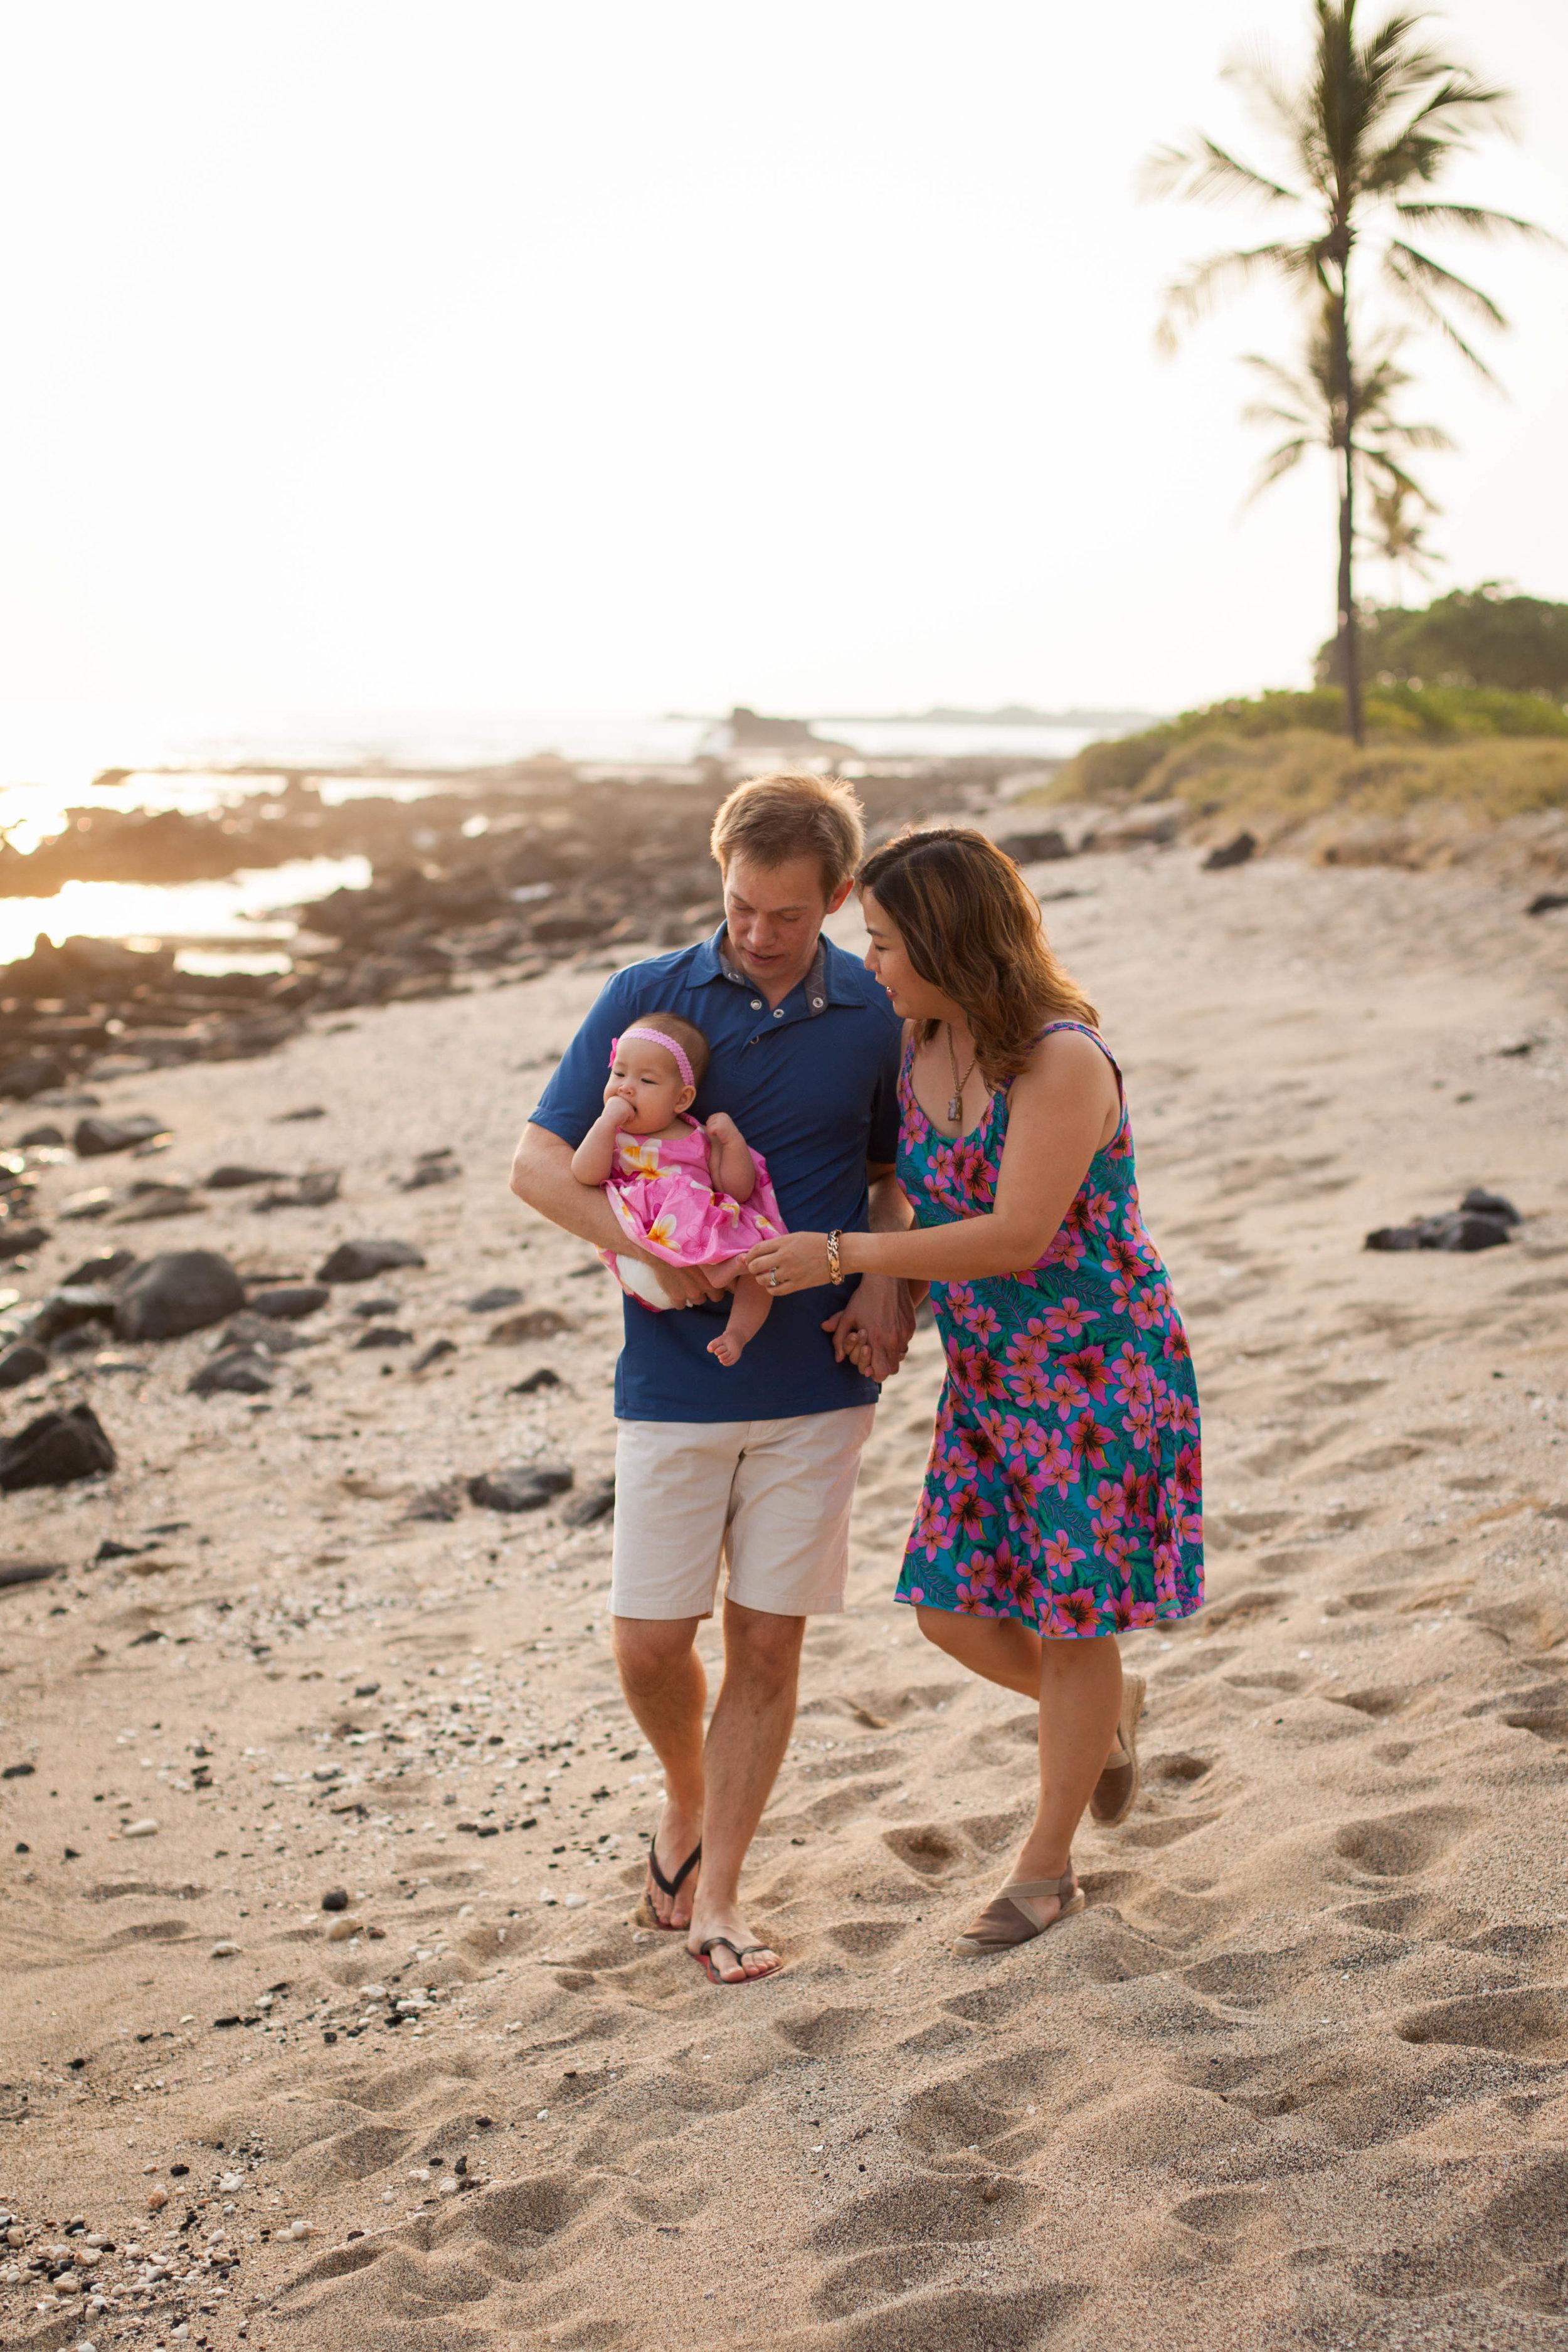 big island hawaii old kona airport beach family © kelilina photography 20170405175348.jpg